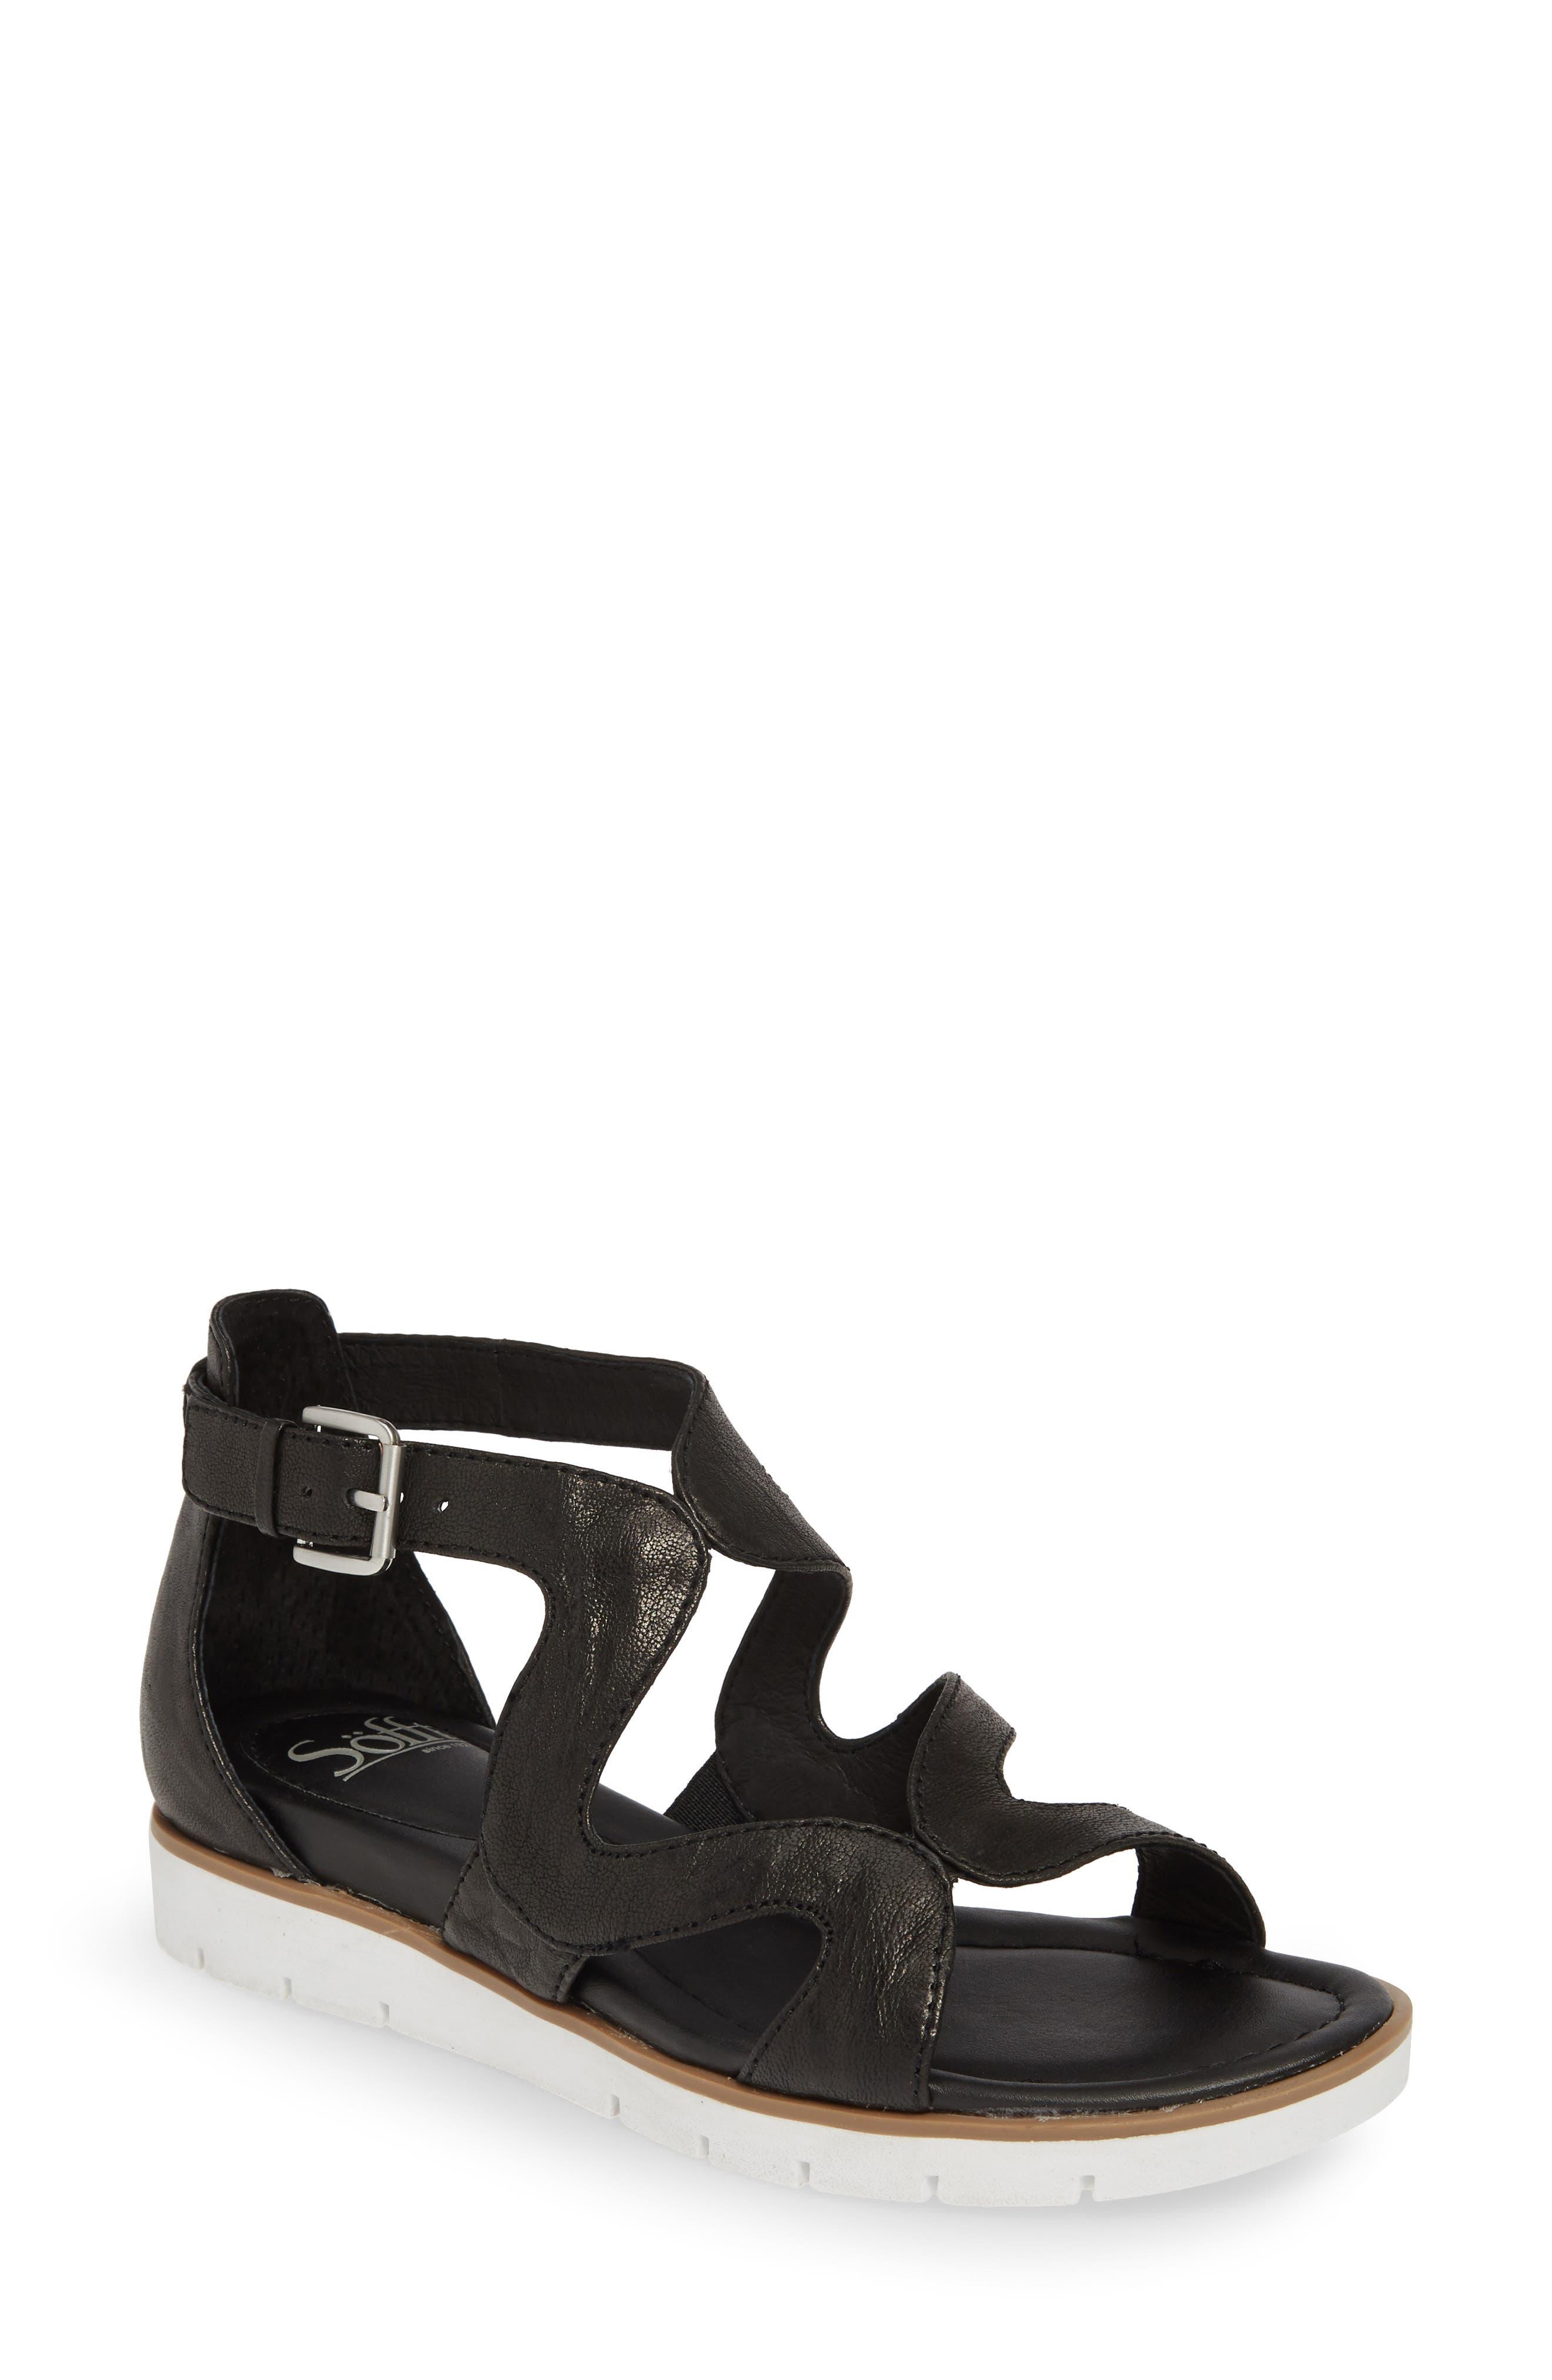 SÖFFT 'Malana' Leather Sandal, Main, color, BLACK LEATHER